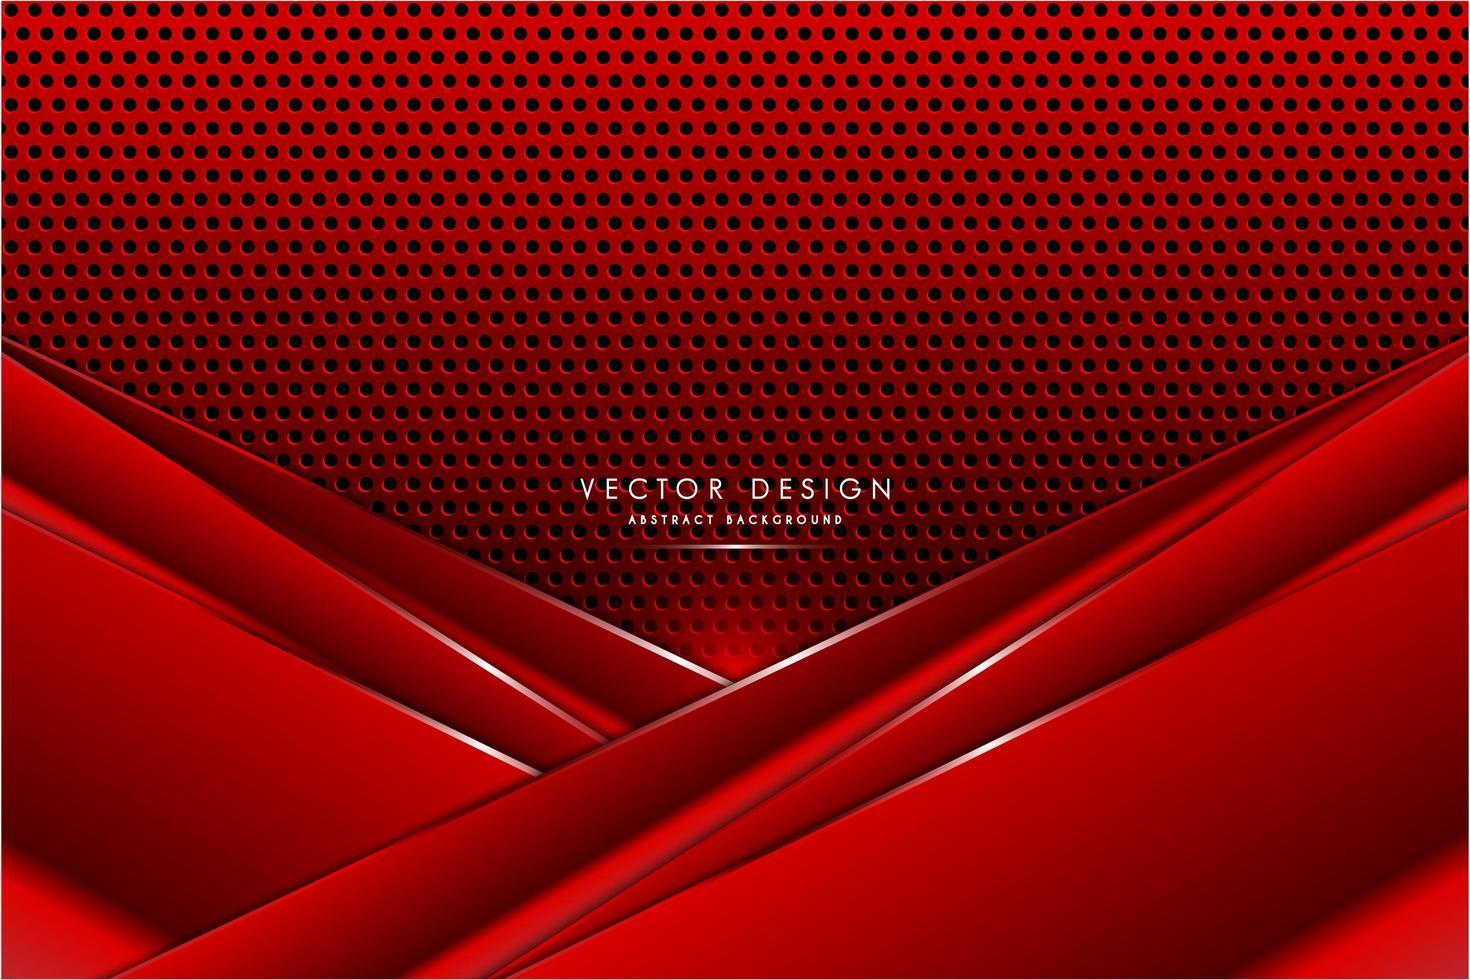 paneles angulares rojos metálicos sobre textura de fibra de carbono vector